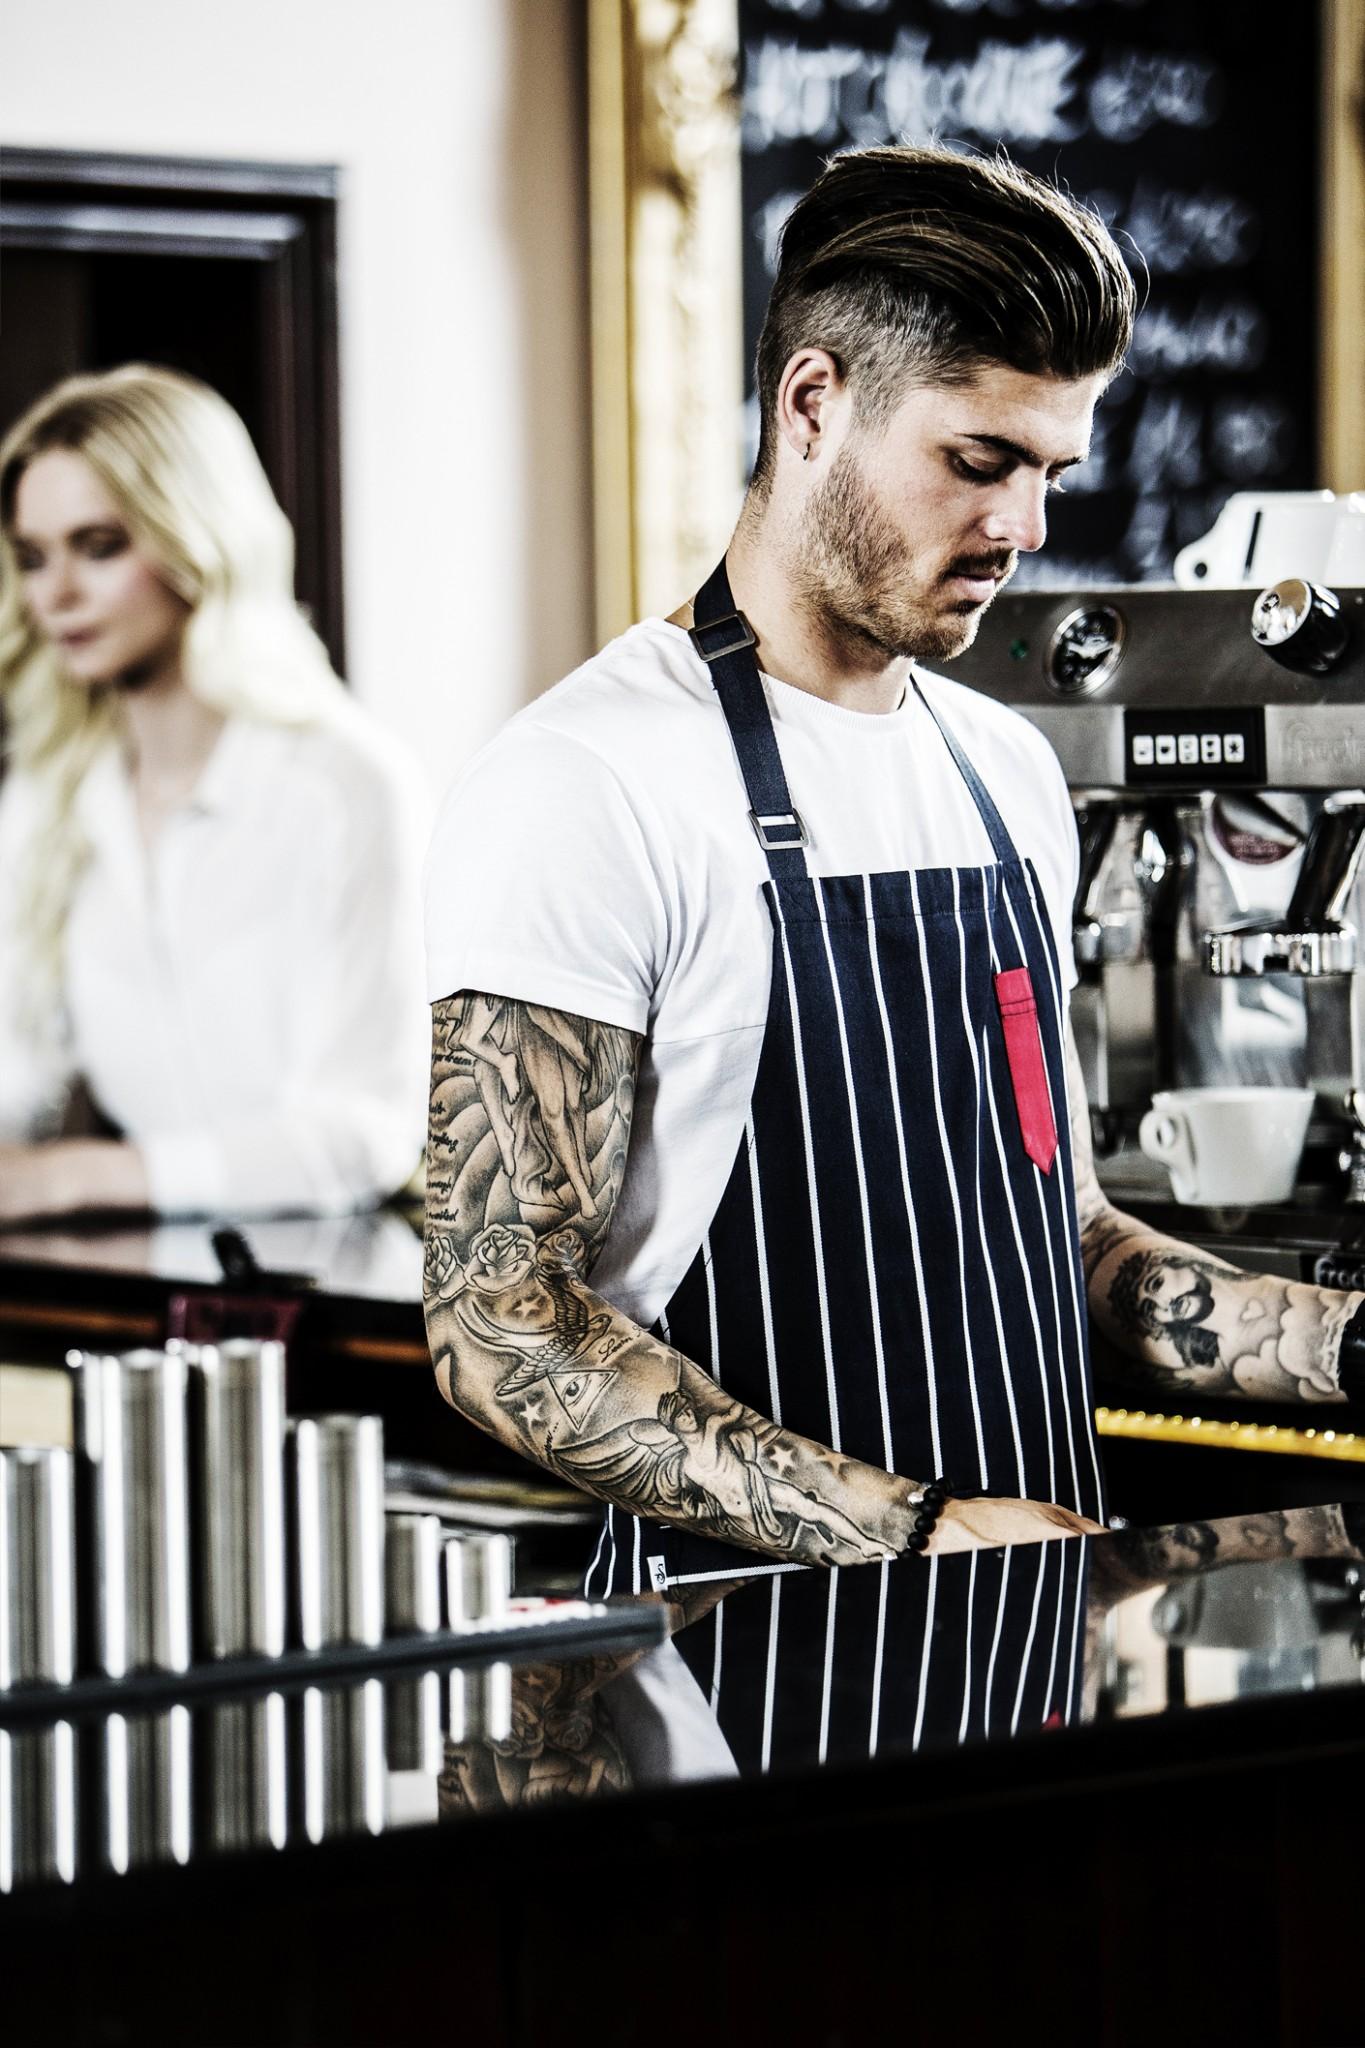 workwear-fashion-and-lifestyle-photographer-manchester